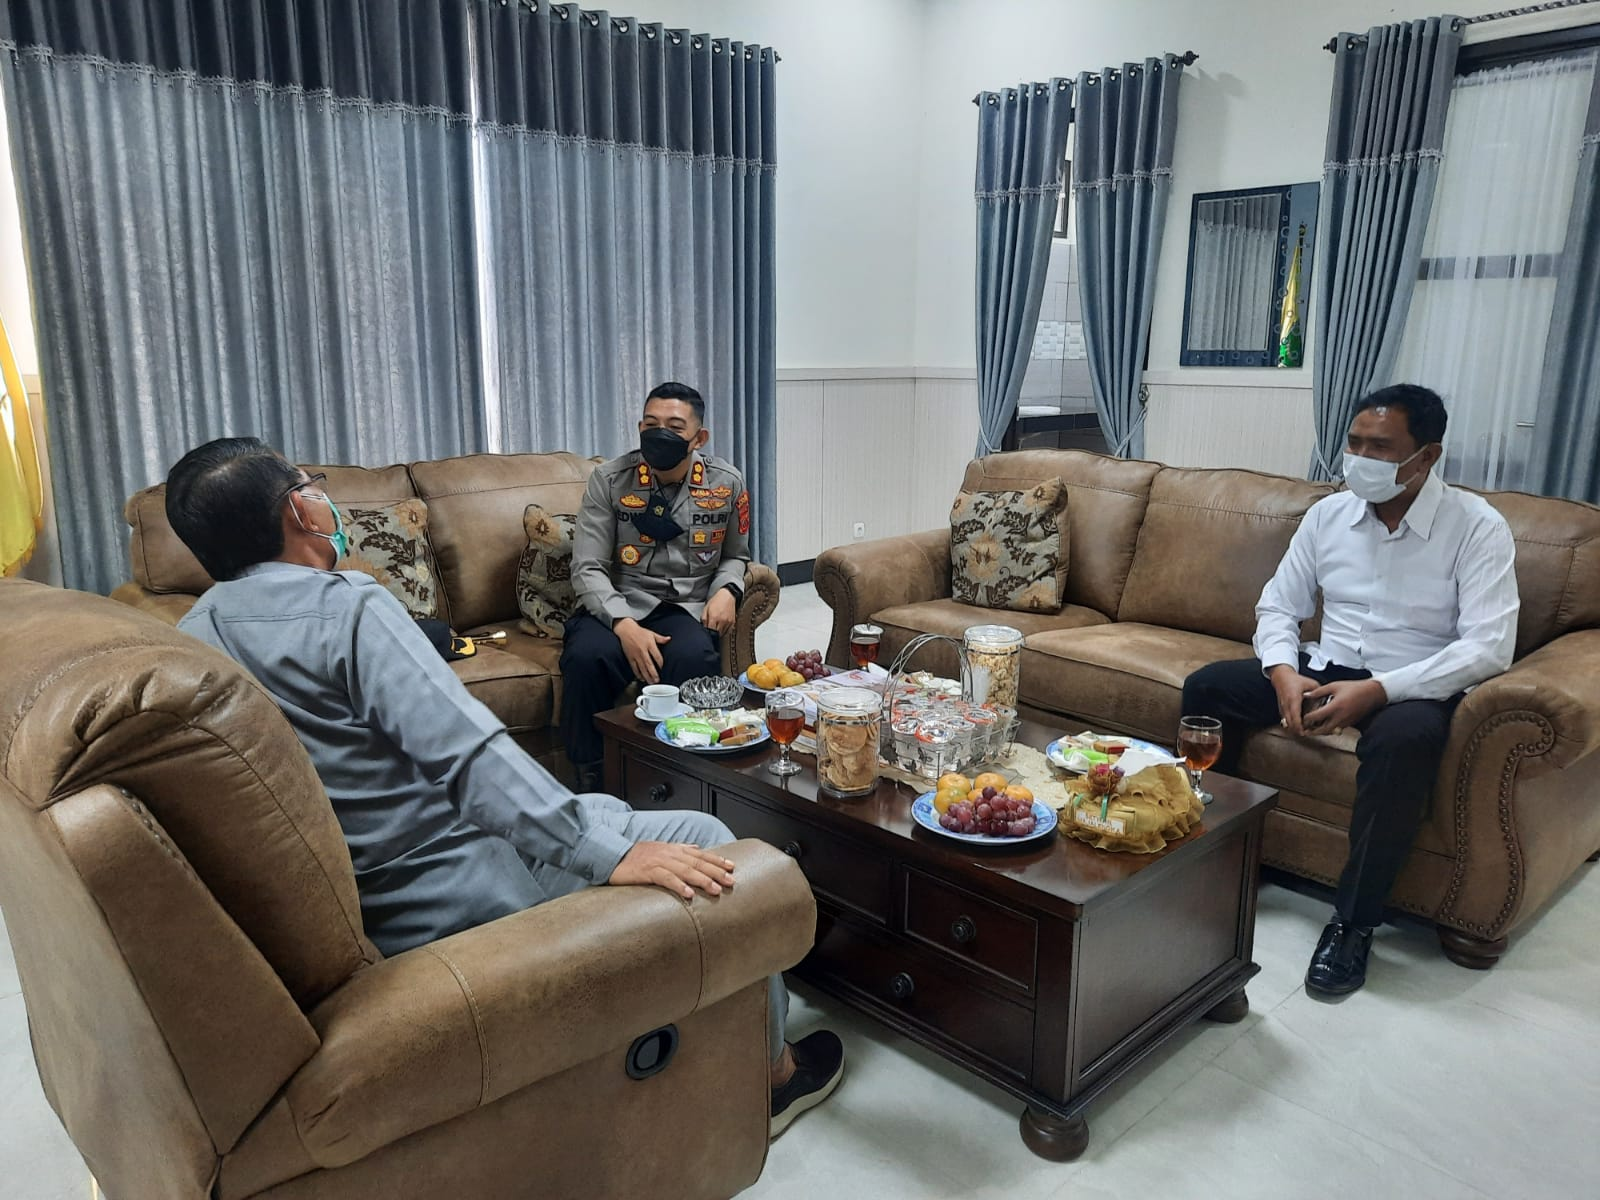 Jalin Sinergitas dan Ciptakan Kamtibmas Yang Kondusif, Kapolres Majalengka Silaturahmi Dengan Ketua DPRD